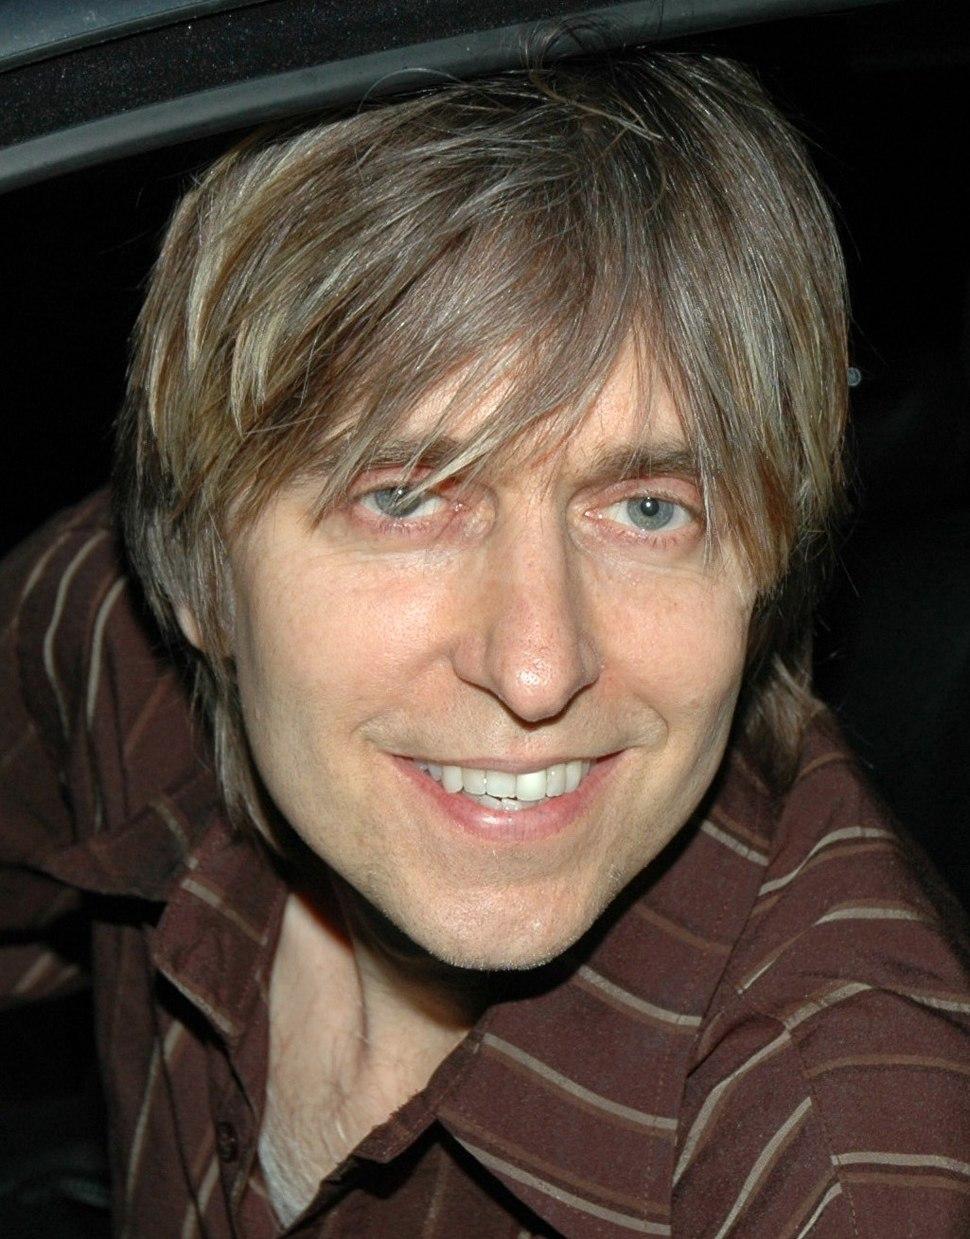 Head shot of a man wearing a brown-striped shirt